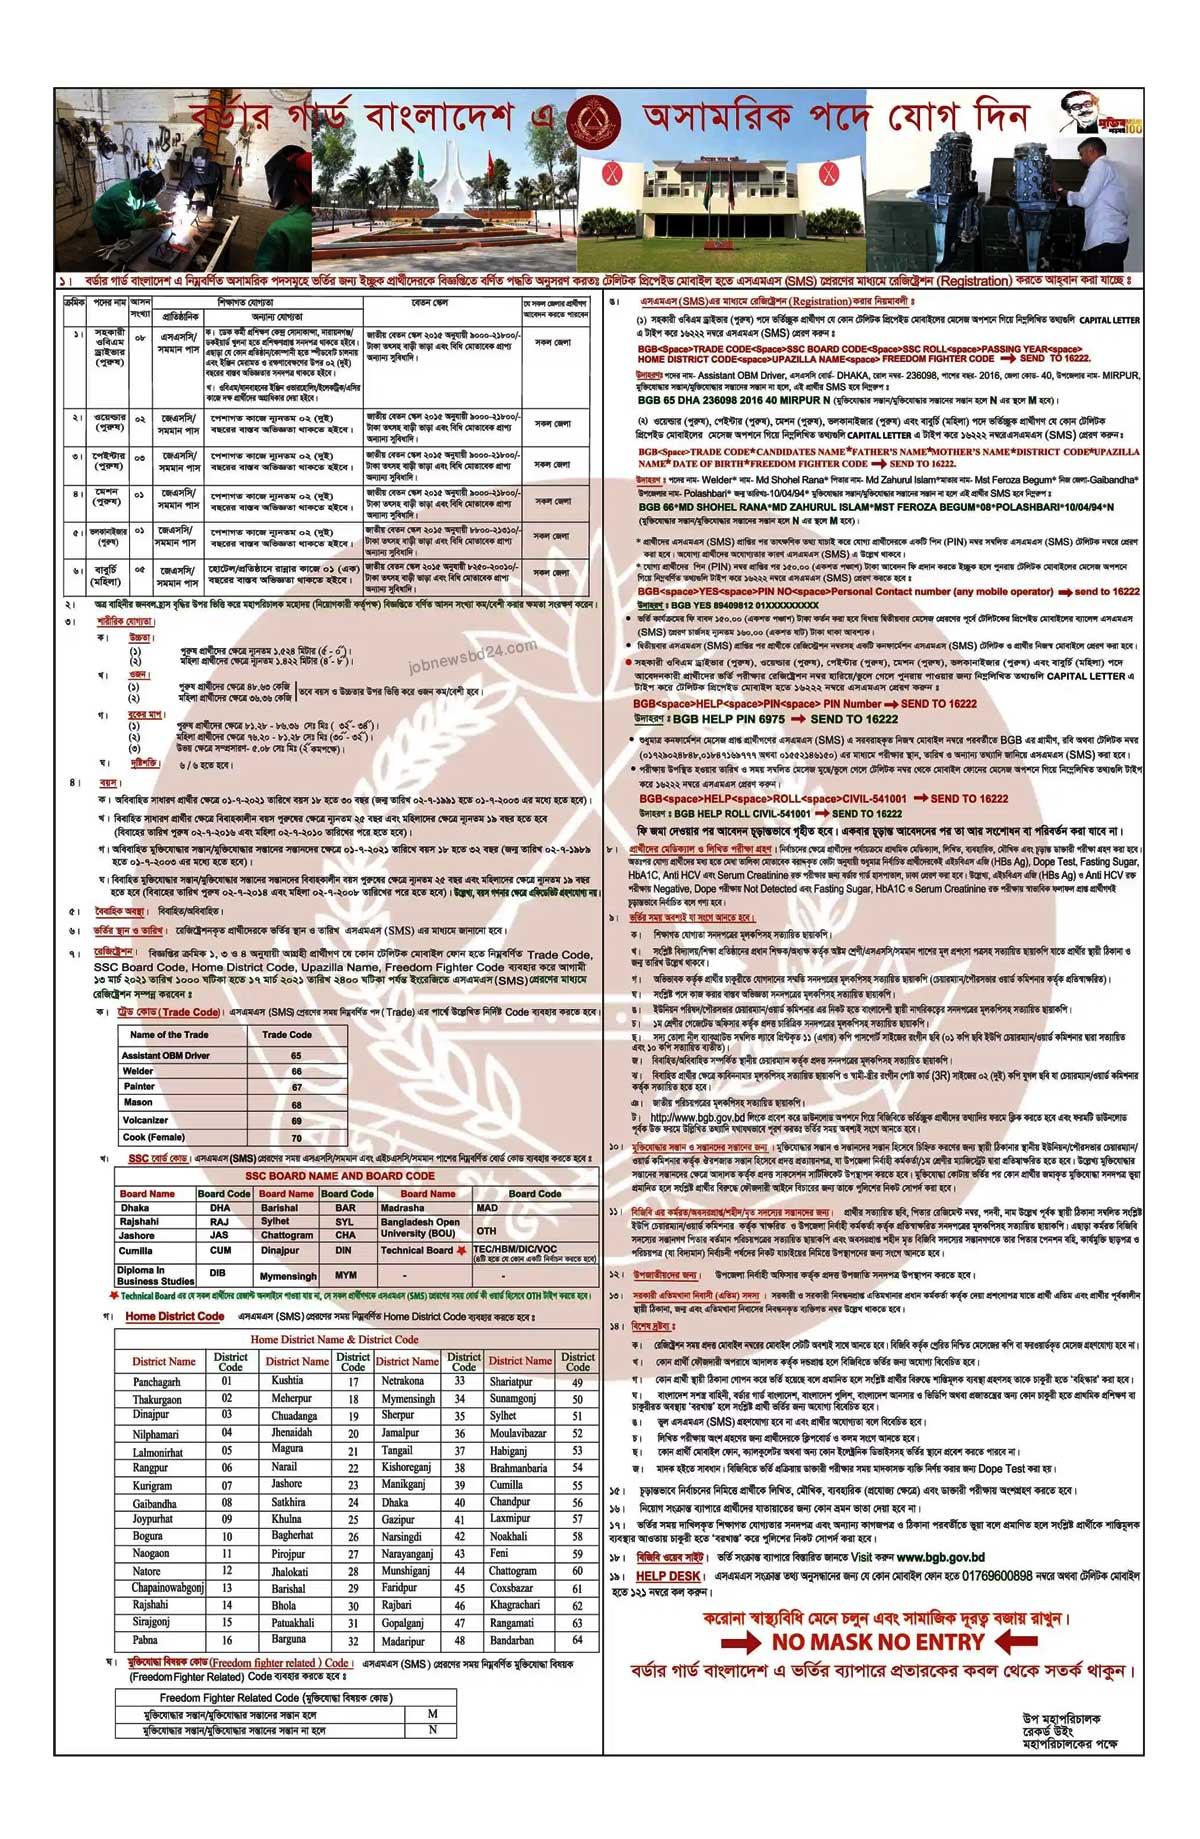 Bangladesh Border Guard Job Circular